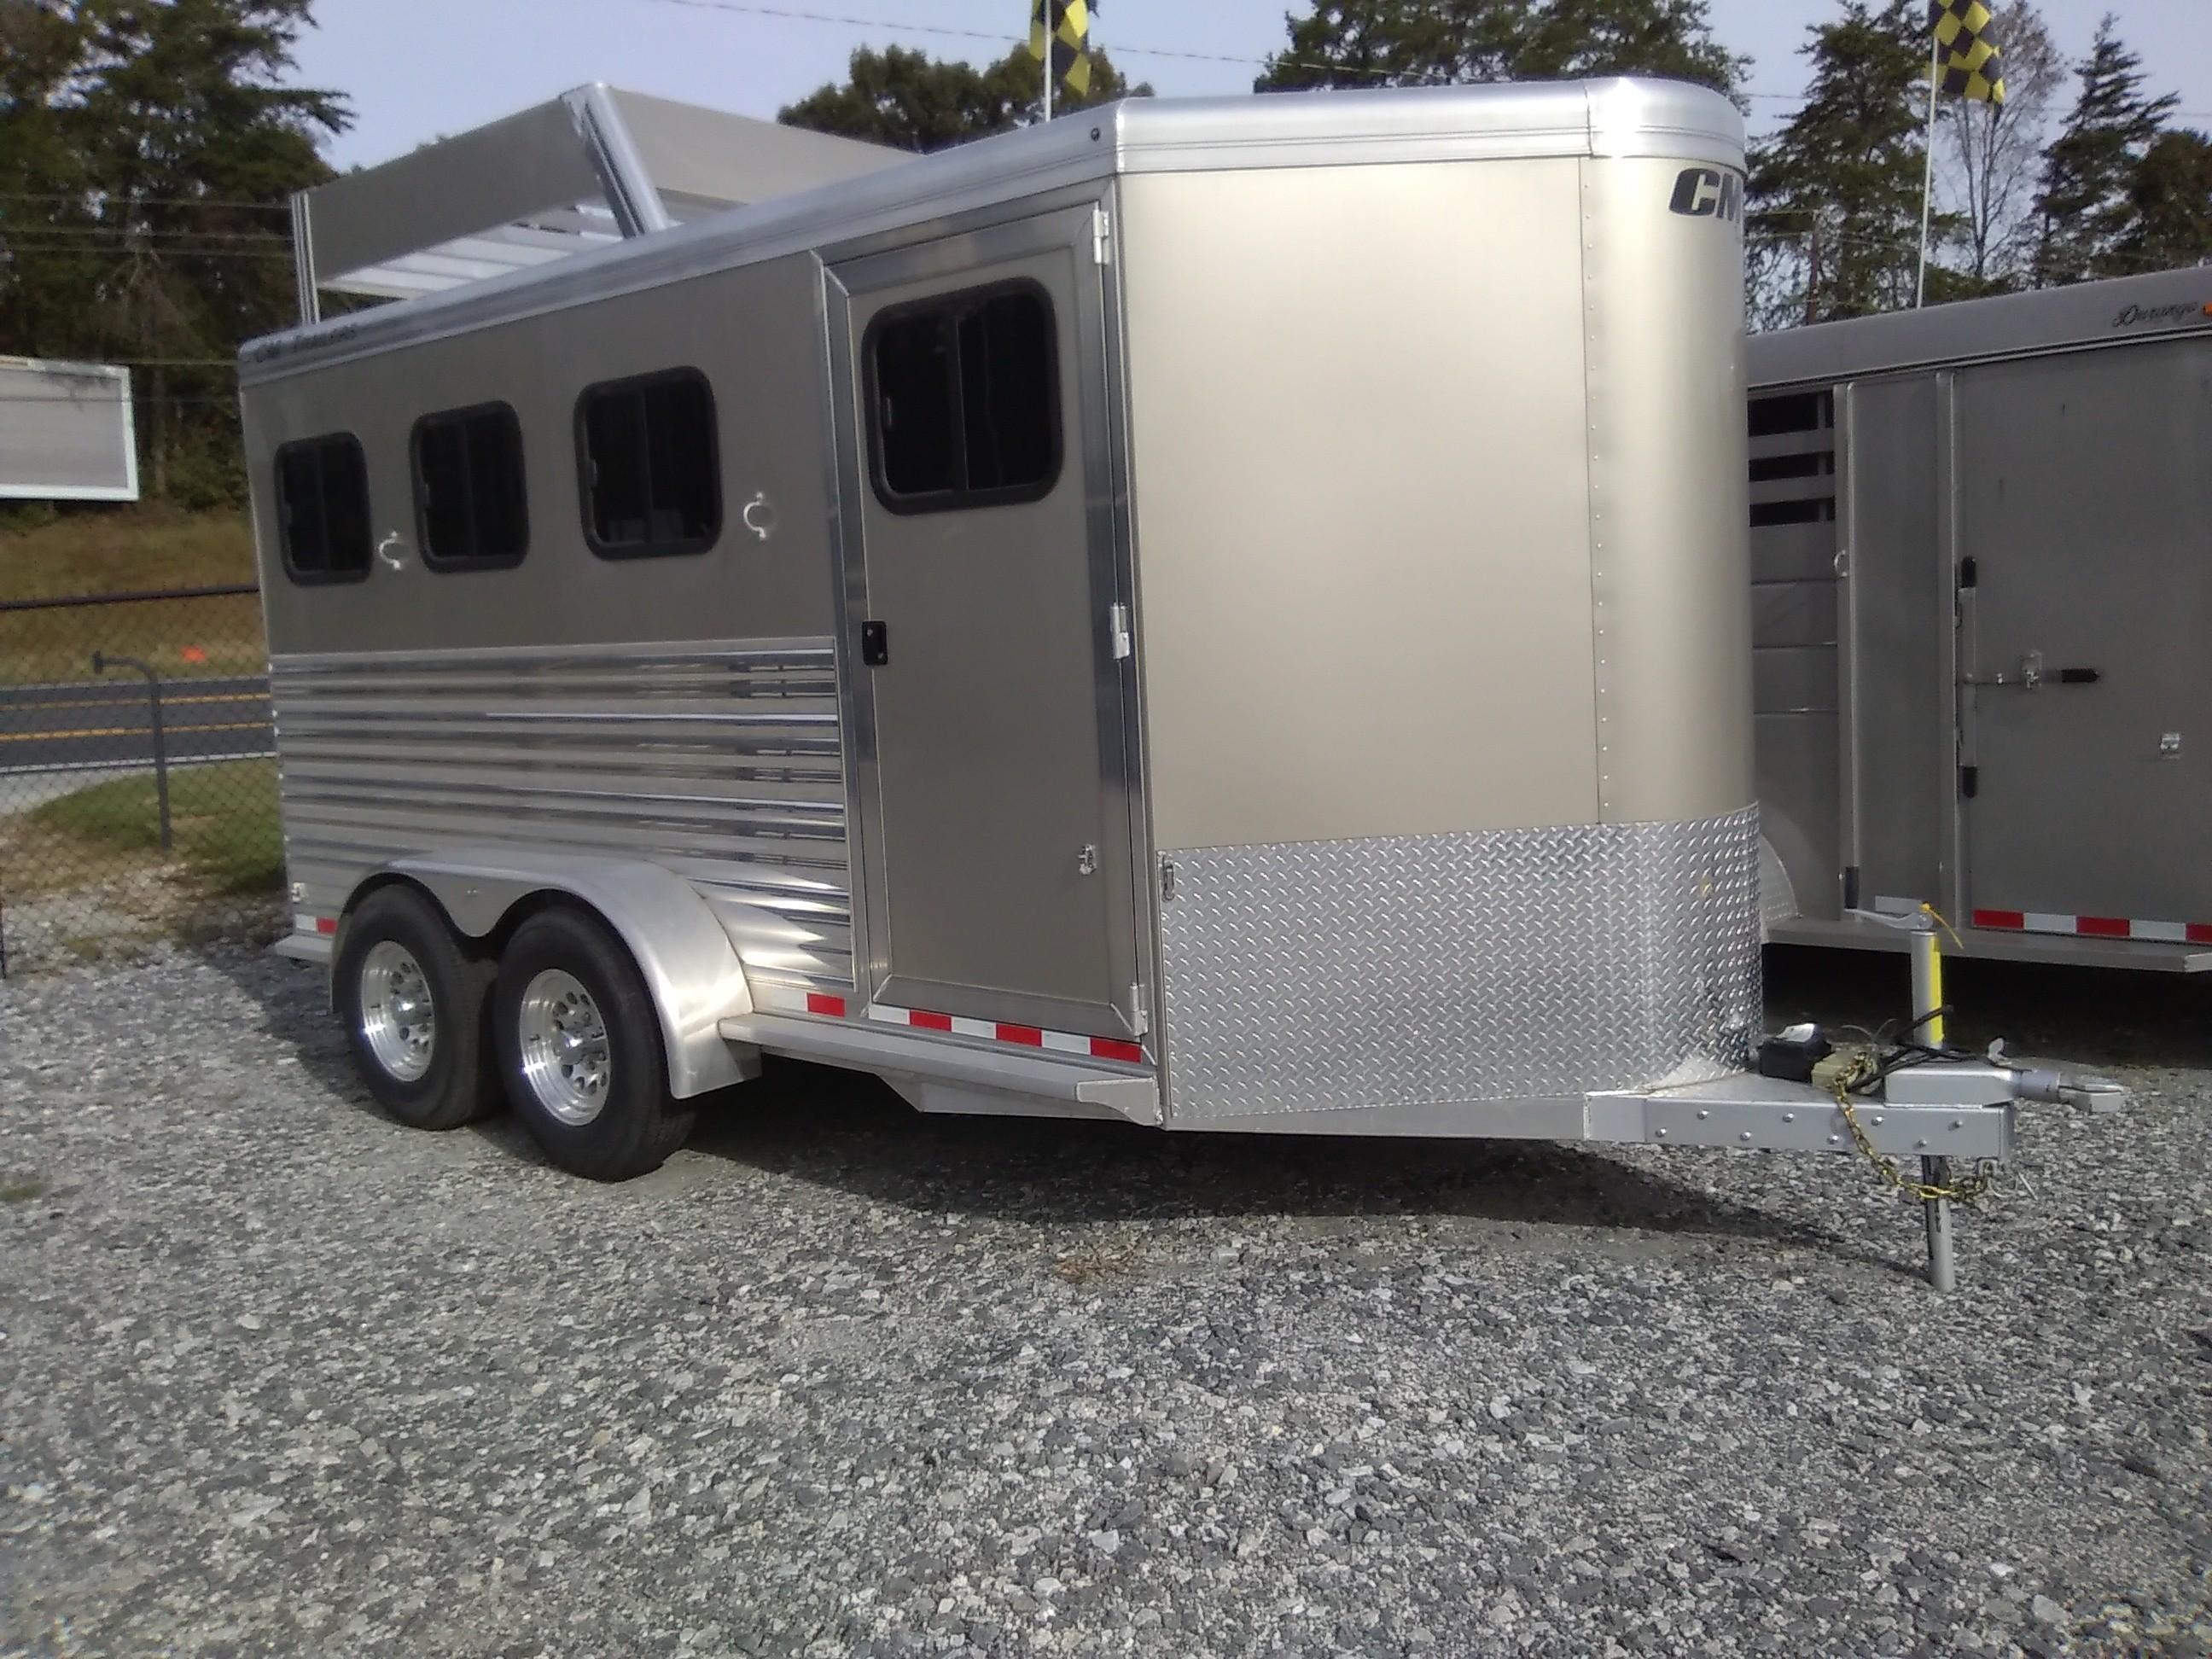 Georgia Trailers For Sale Repair Car Haulers Horse Cargo Trailer Skid Steer On Utility Wiring And Lights 2018 Cm 16 Renegade 3